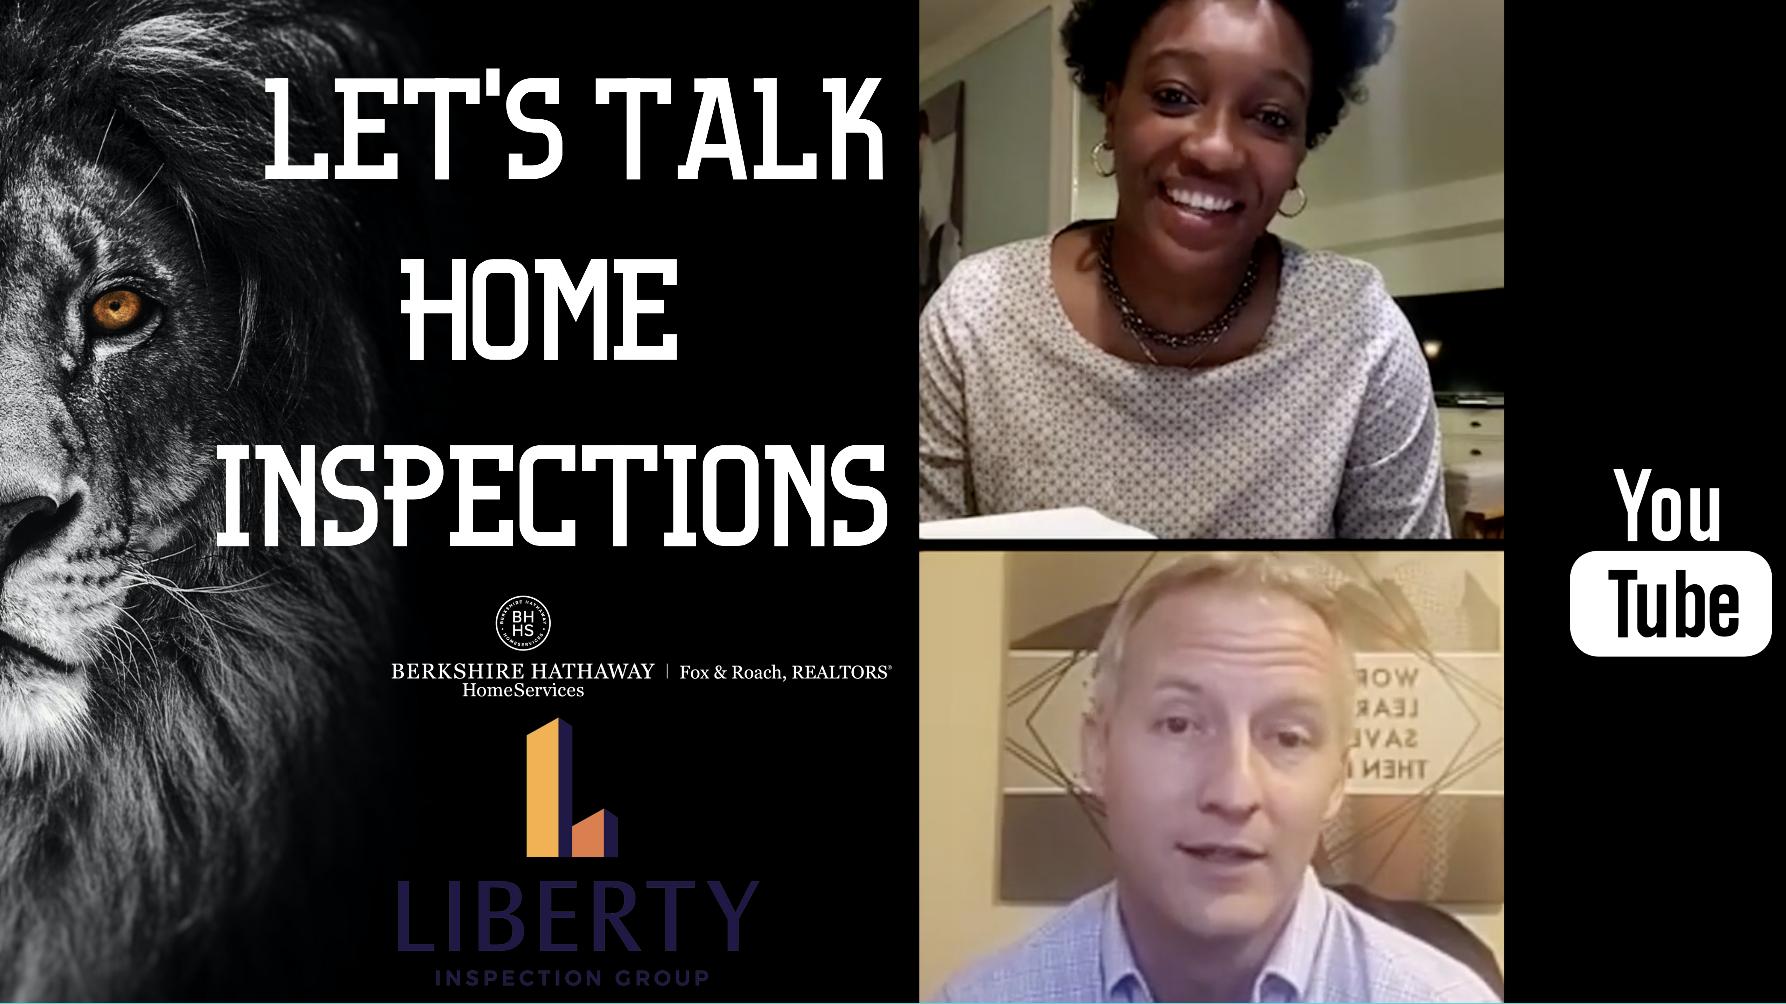 Let's Talk Home Inspections-Philadelphia Market